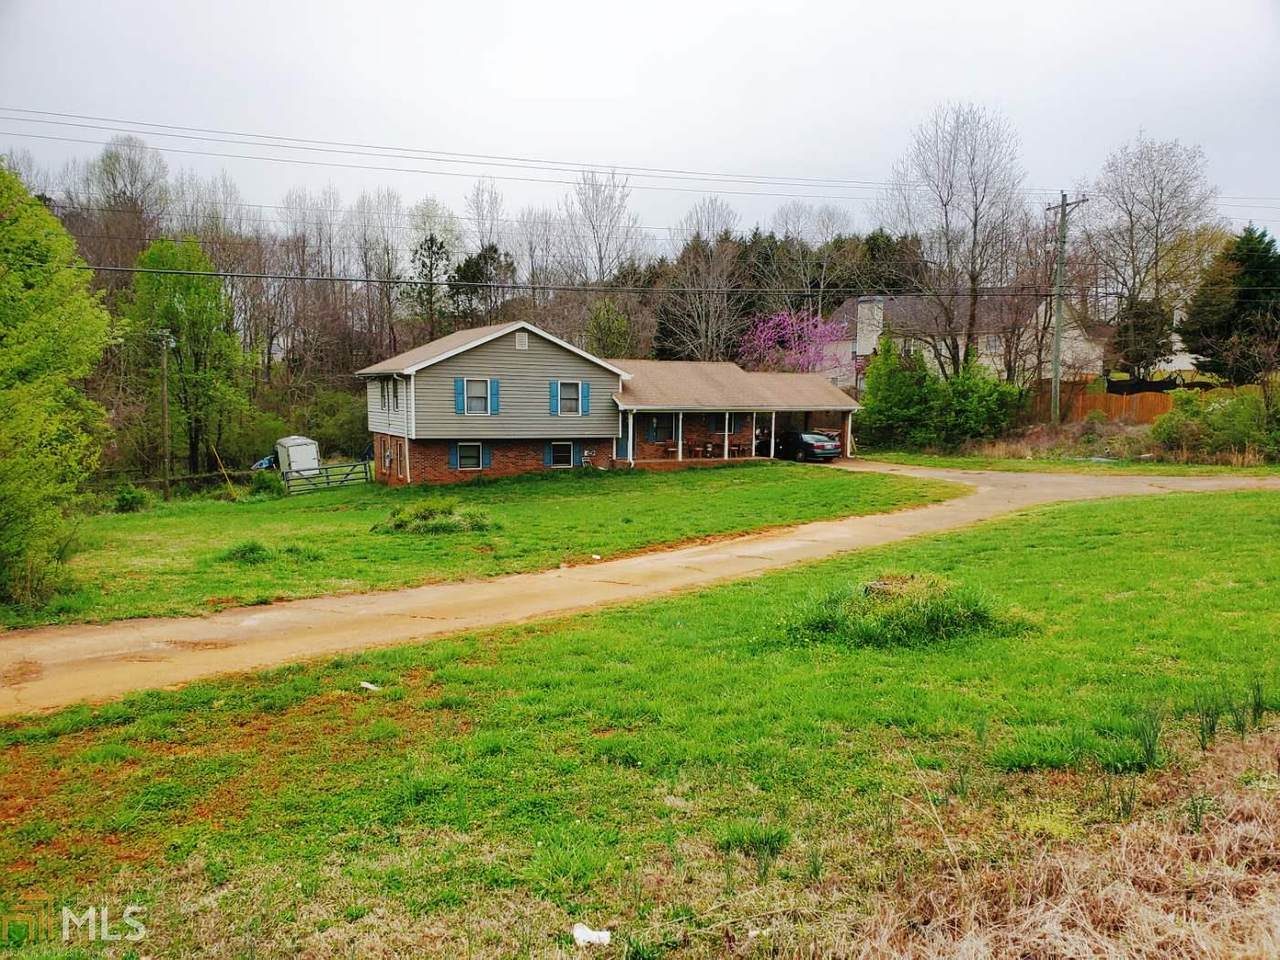 885 Auburn Rd - Photo 1